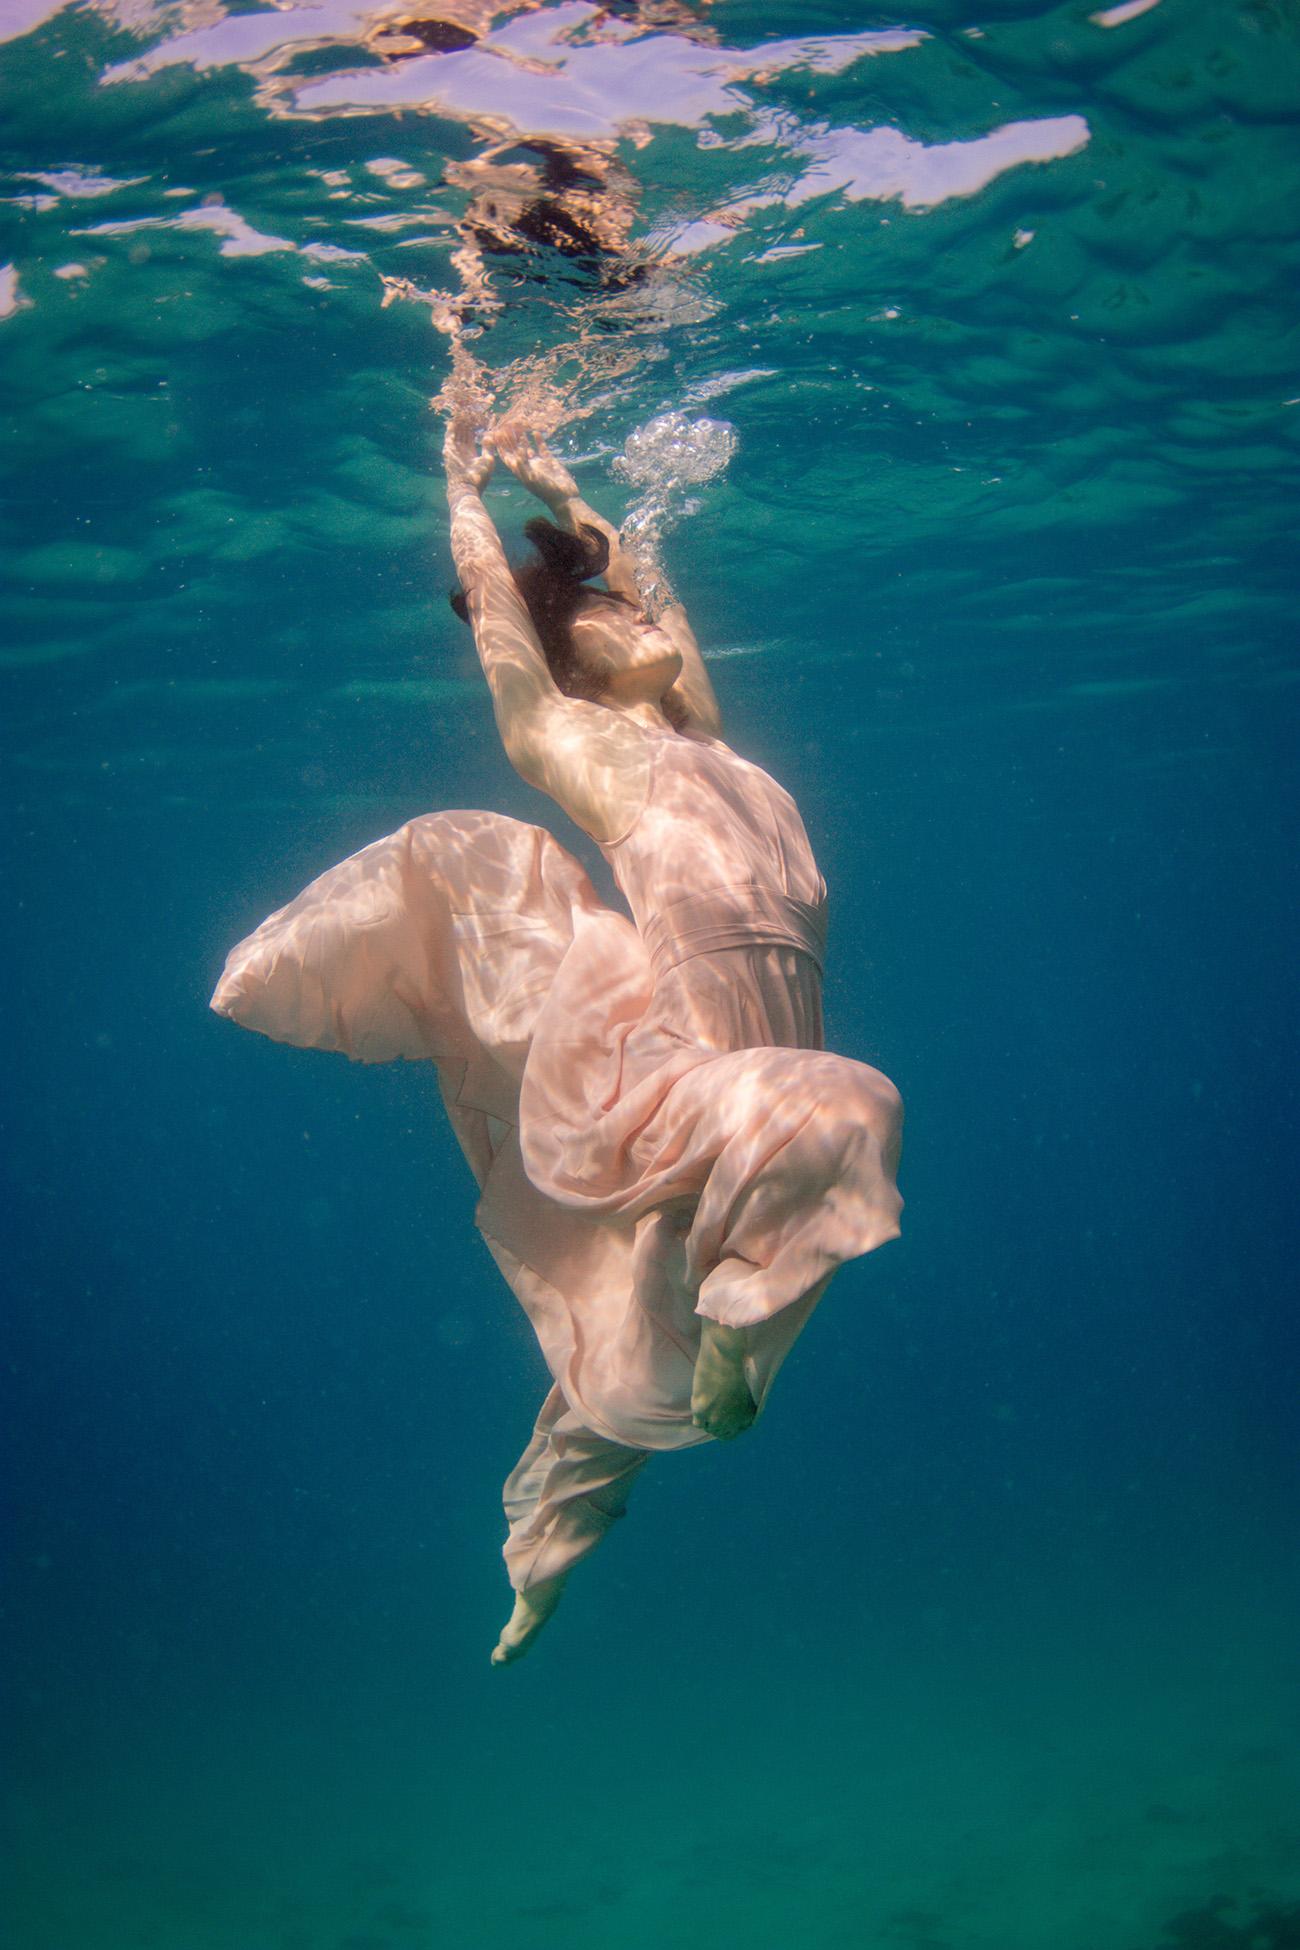 Bride underwater for her photoshoot